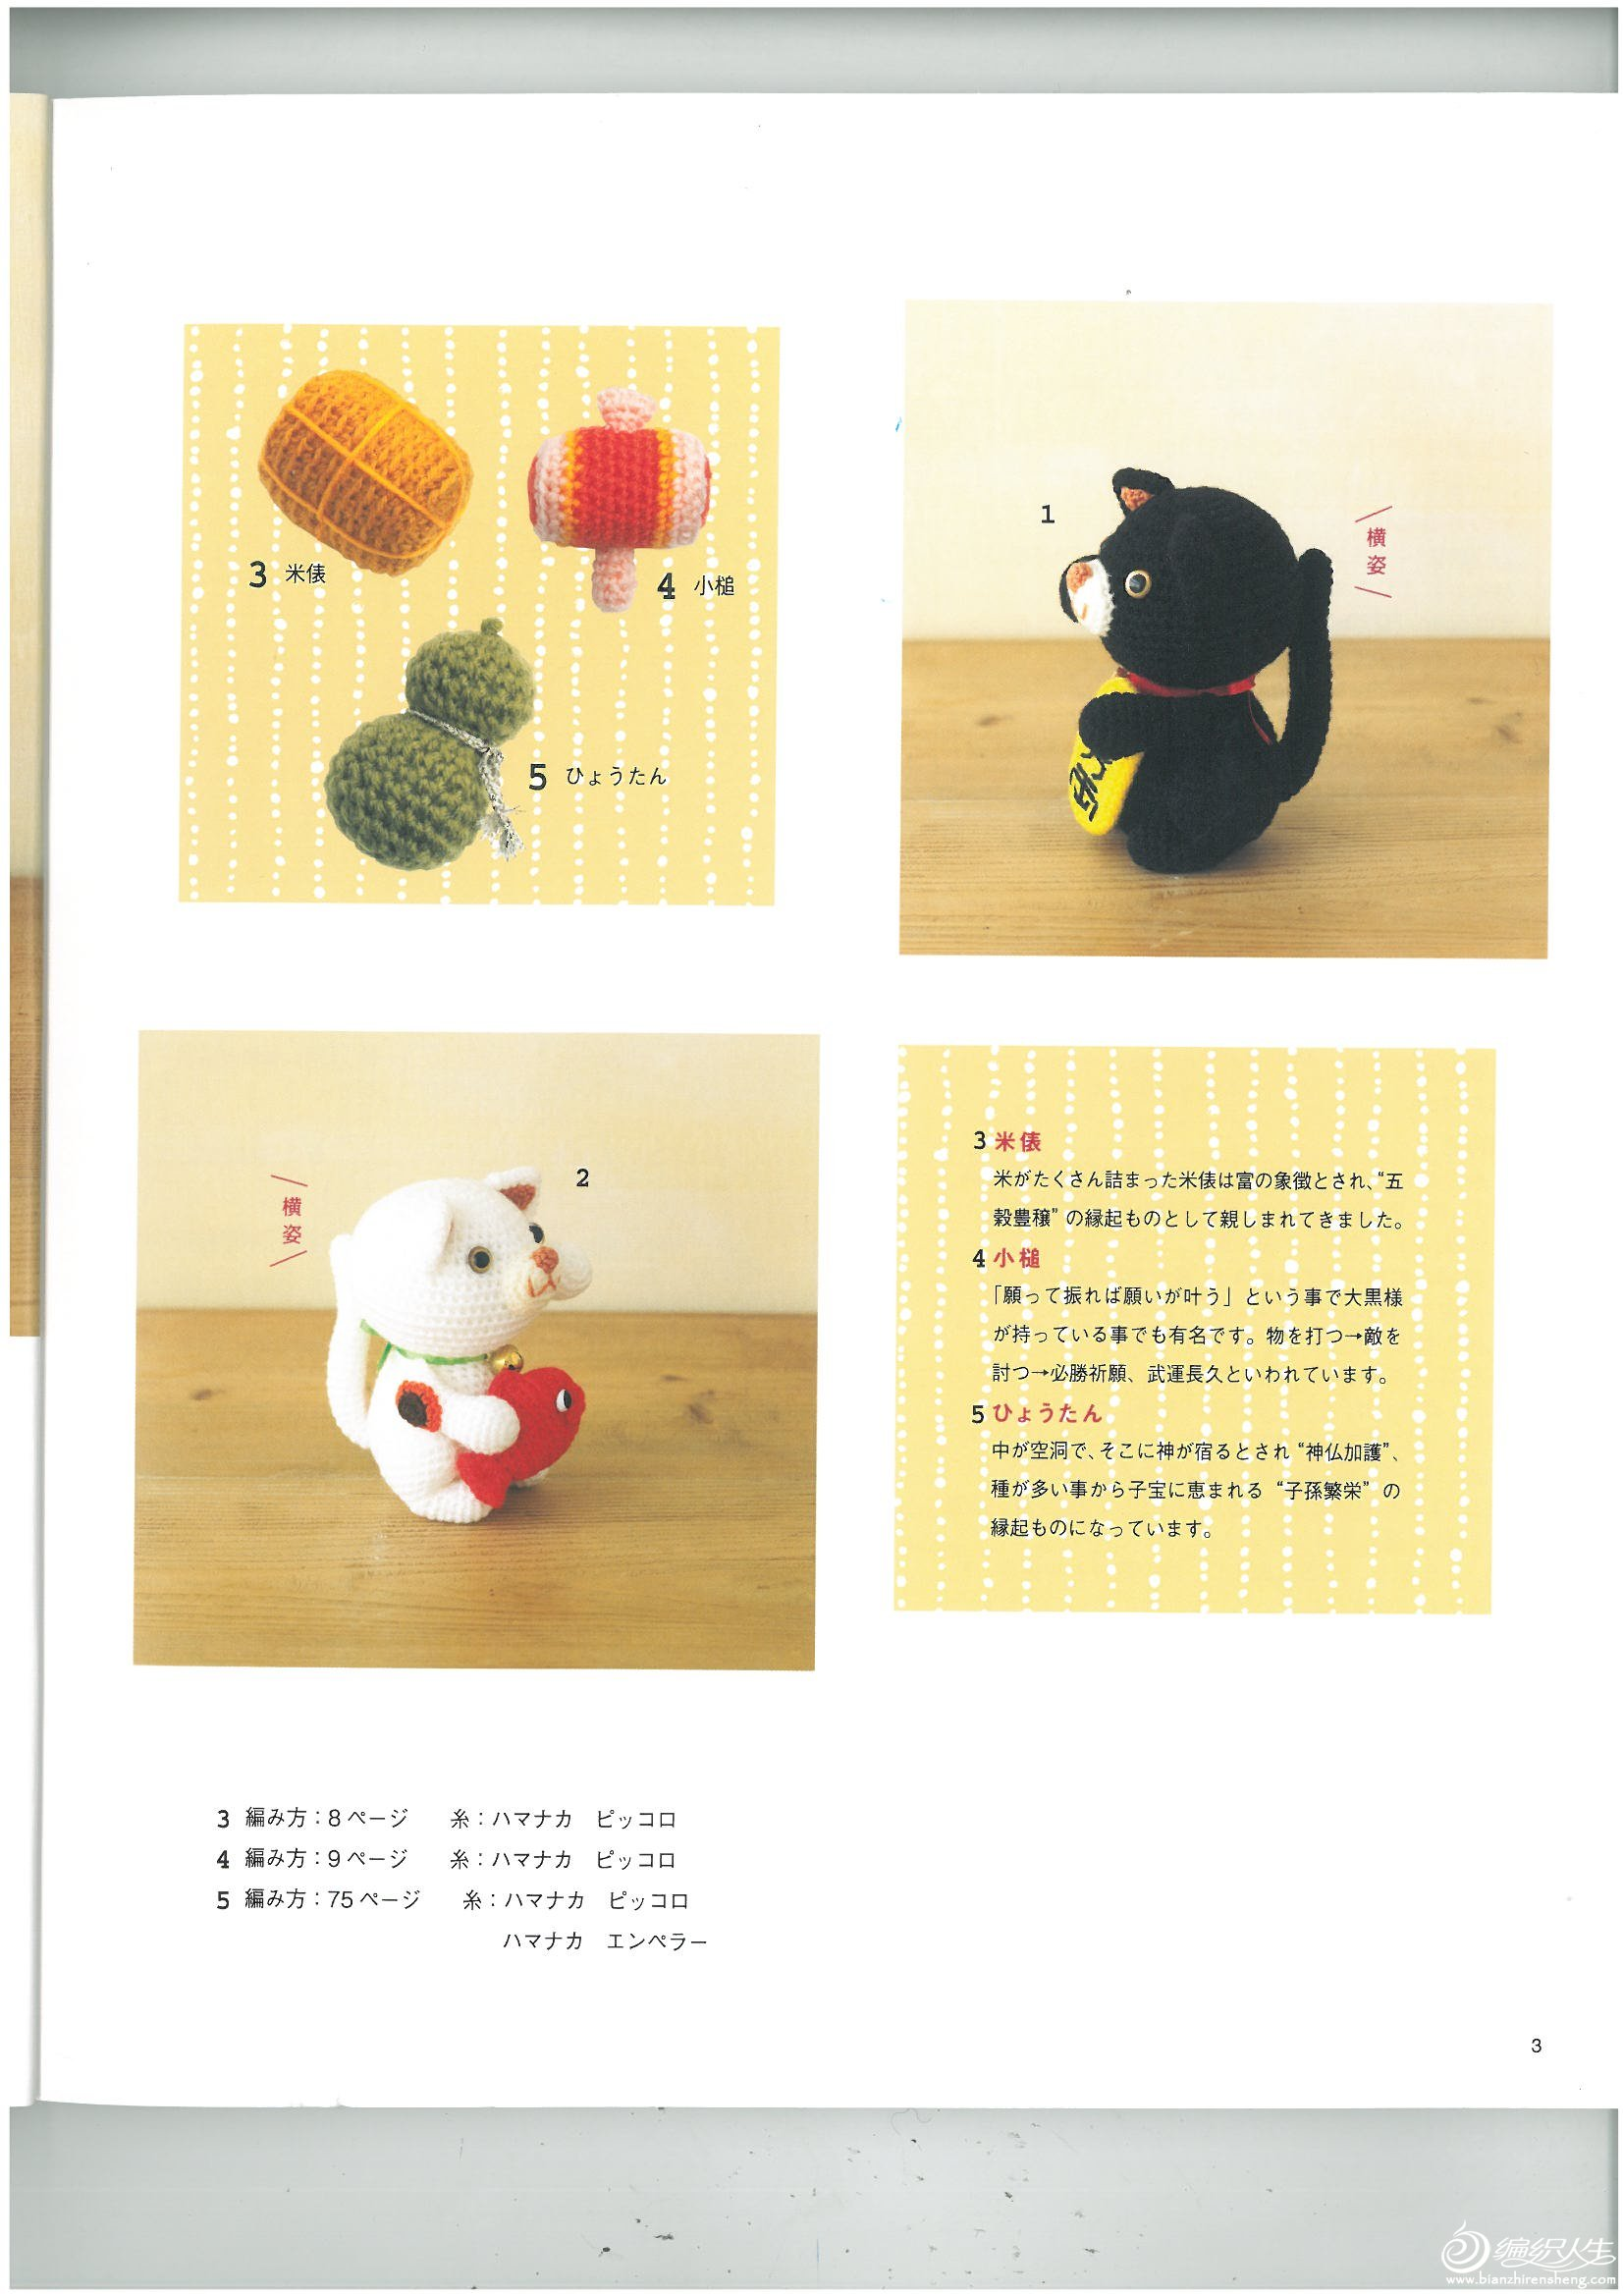 p.3.jpg